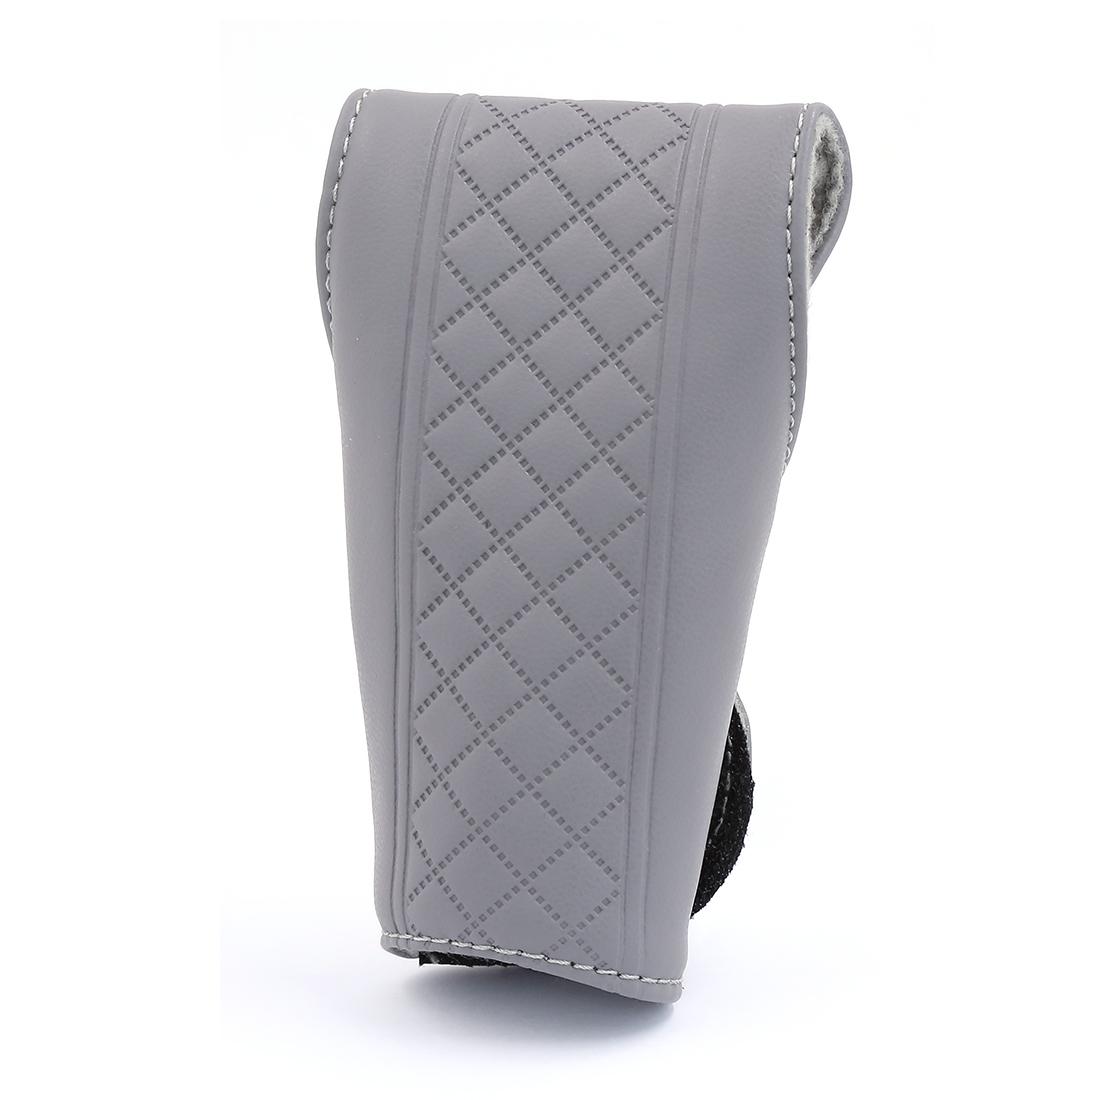 Universal Faux Leather Nonslip Detachable Closure Car Gear Shift Knob Cover Gray